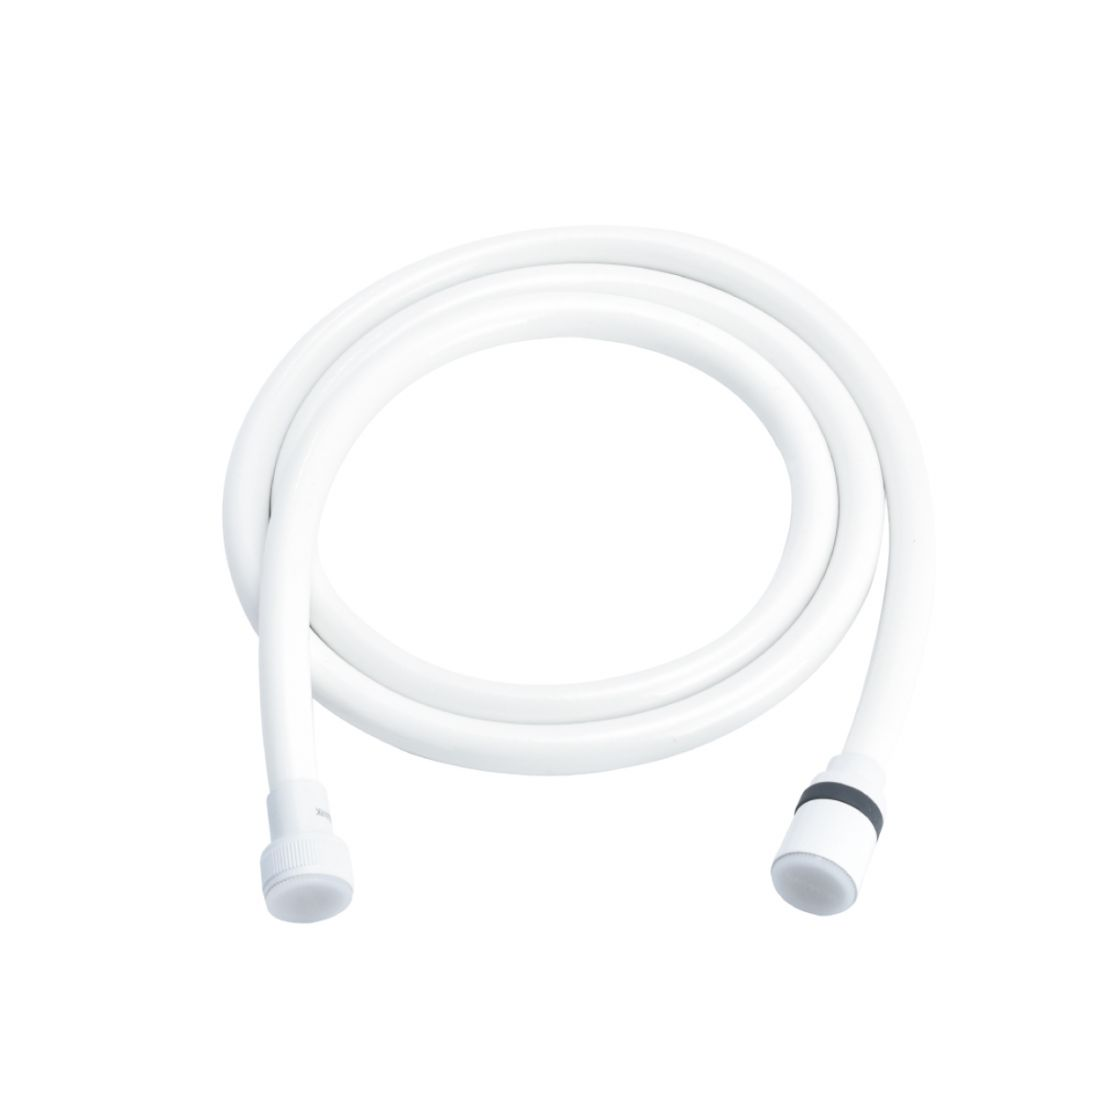 Шланг душевой Lemark (LE8026P-White) ПВХ, 150 см, TURN-FREE